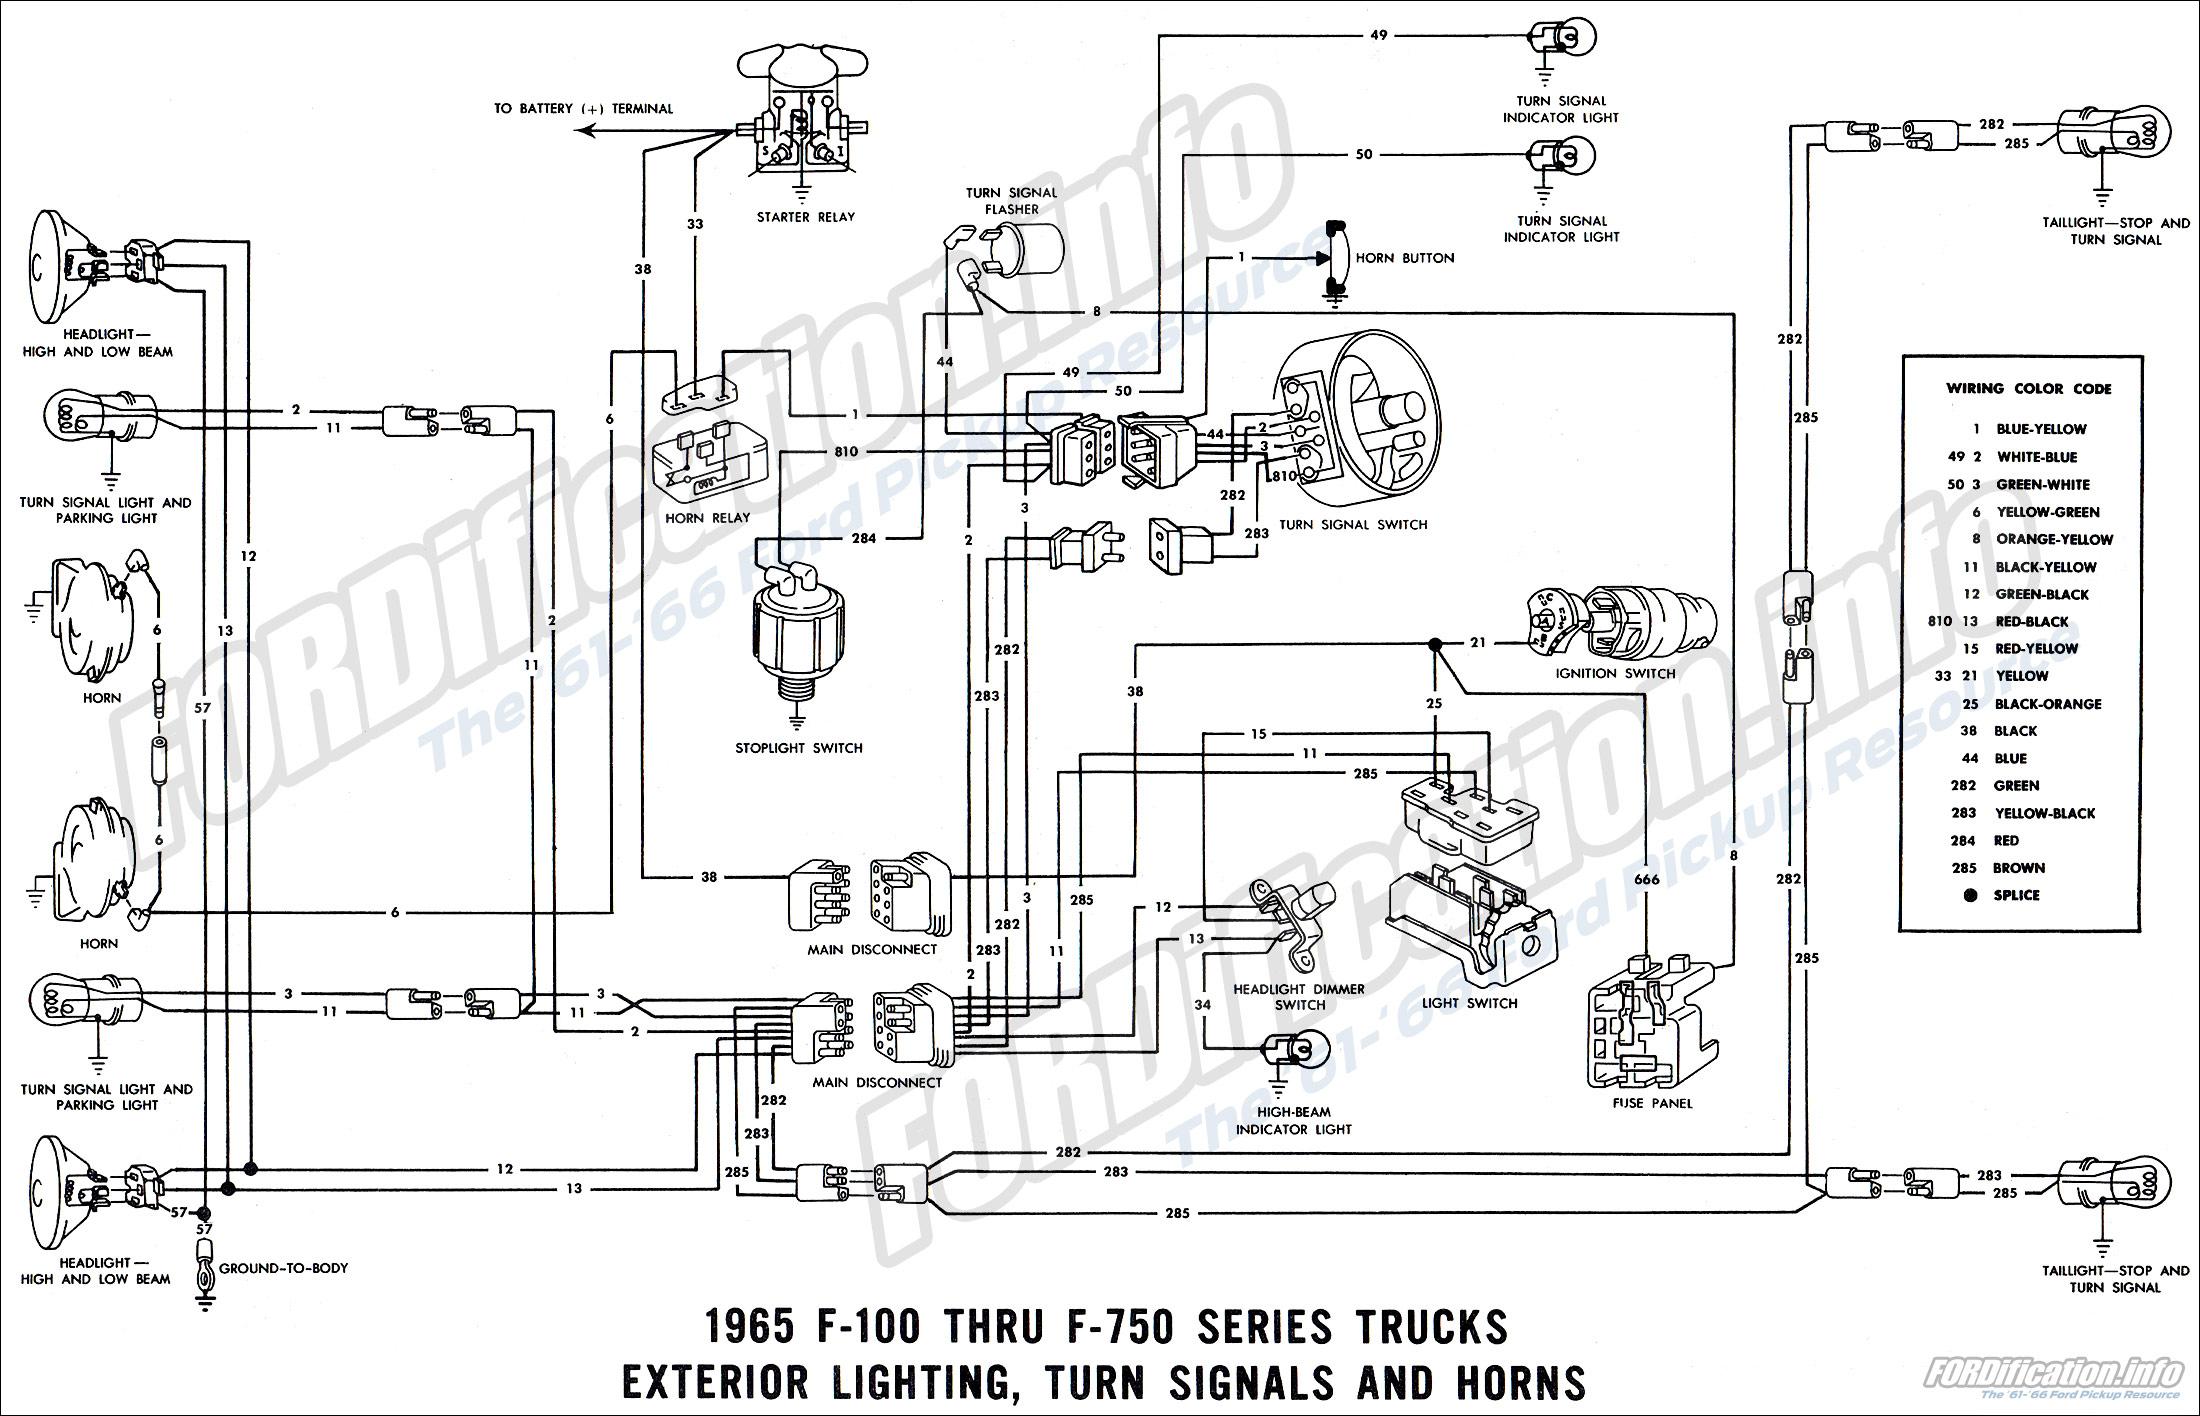 Terrific 1965 Ford Truck Wiring Diagrams Fordification Info The 61 66 Wiring Cloud Biosomenaidewilluminateatxorg